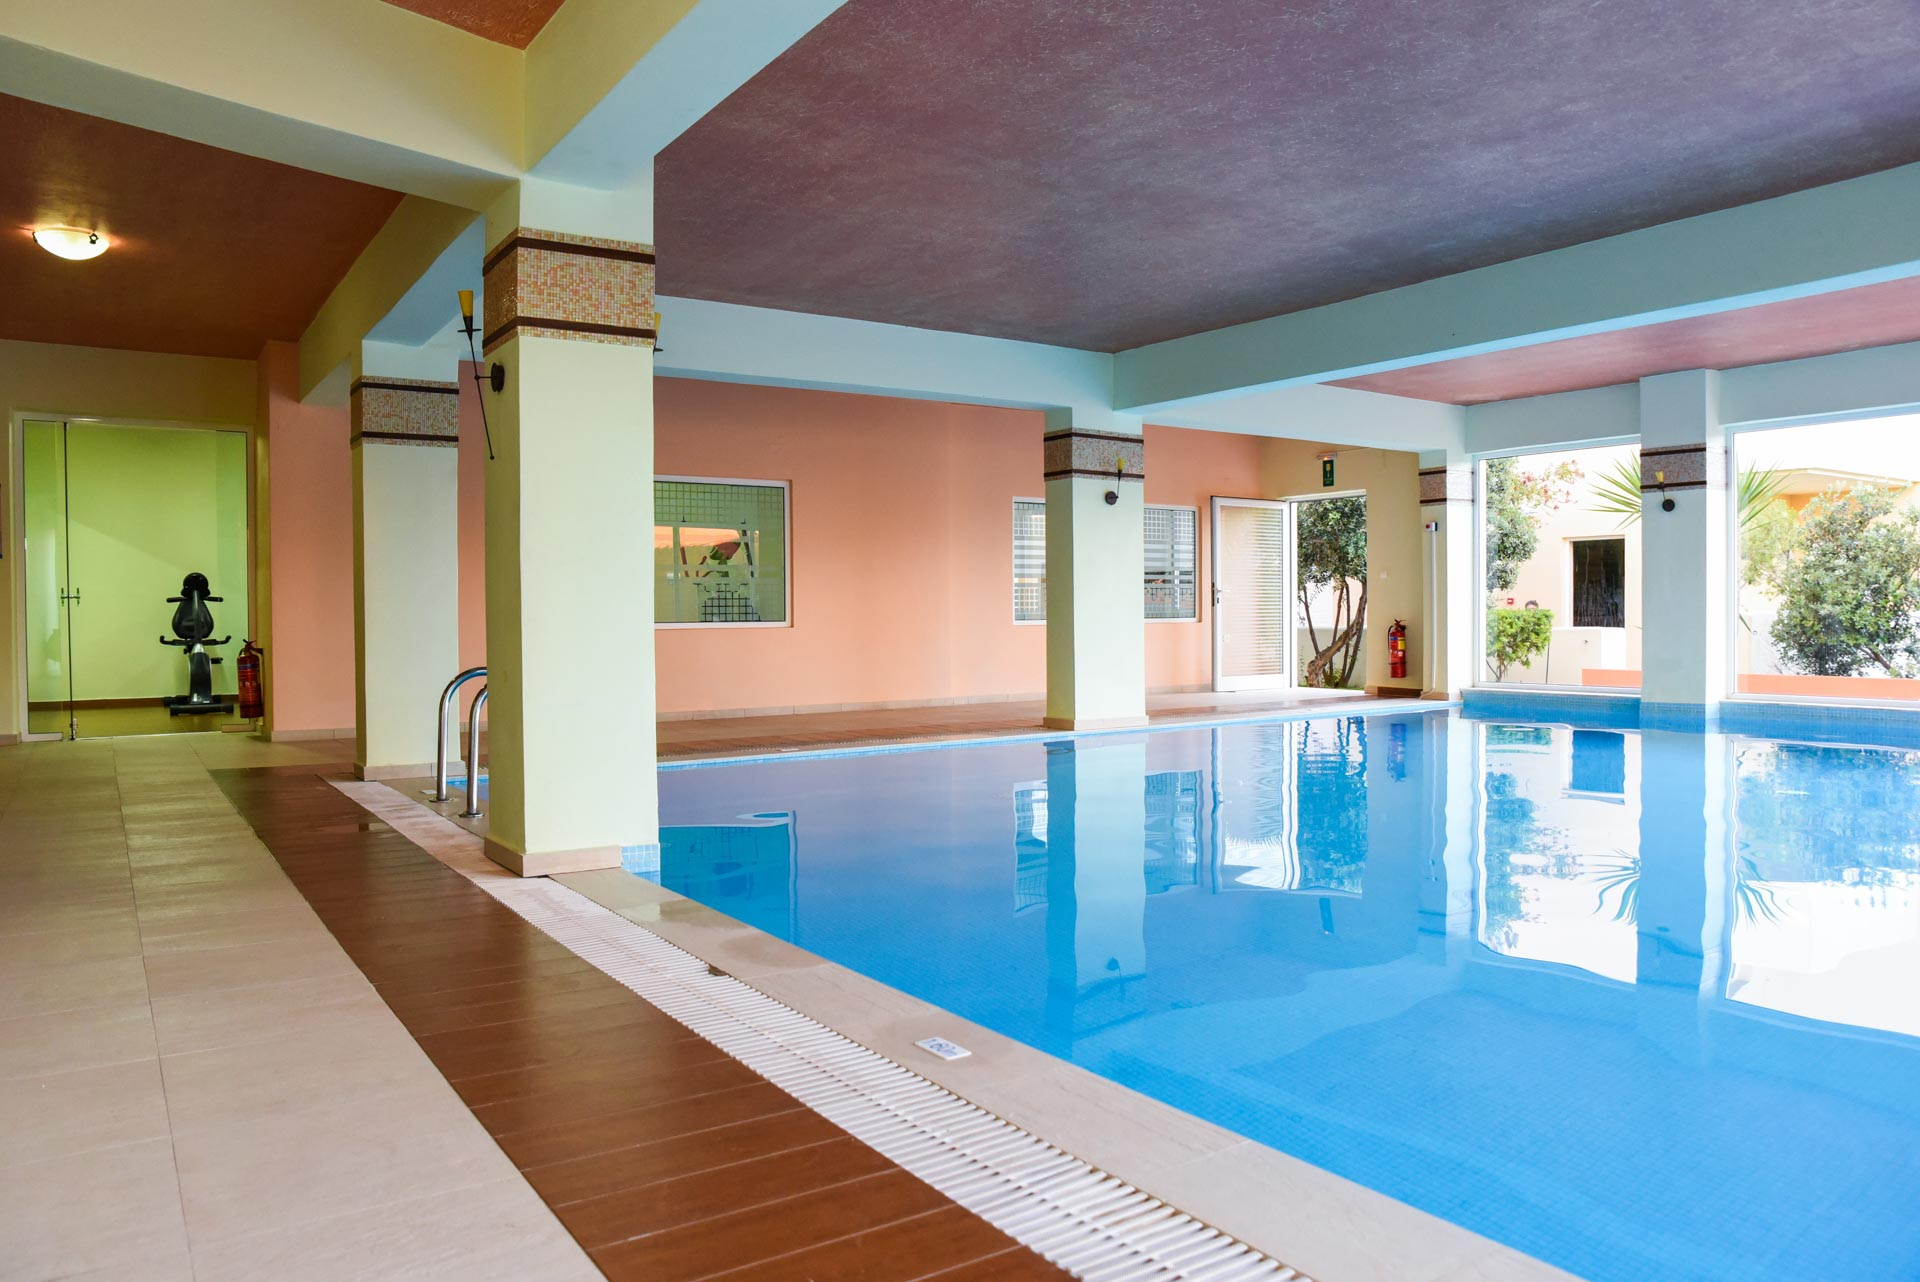 INDOOR POOL & GYM - Theo Hotel | Agia Marina, Chania, Crete